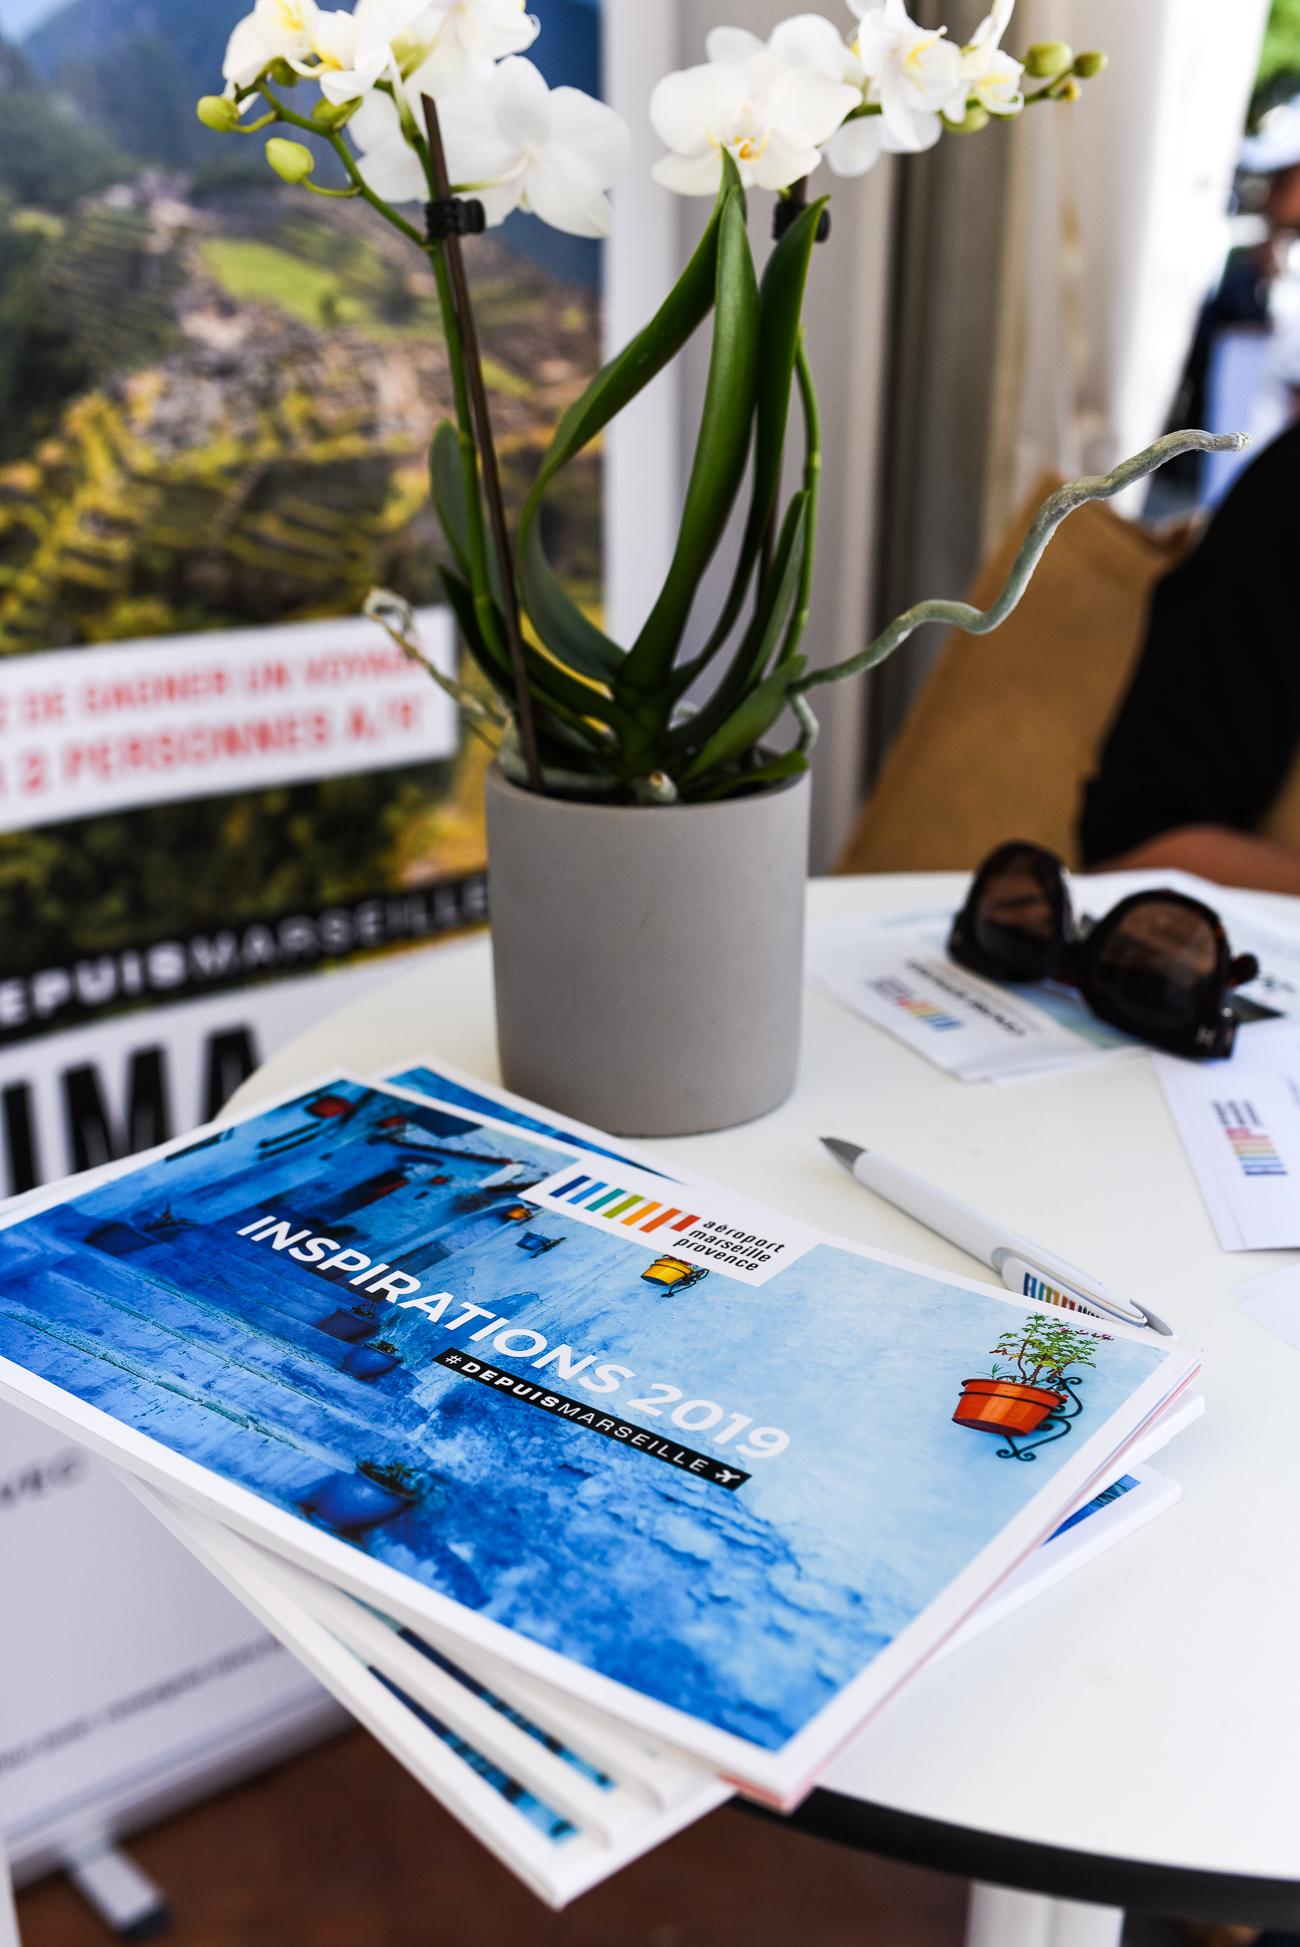 le-studio-twinky-photographe-salon-vivre-cote-sud-2019-aix-en-provence.jpg